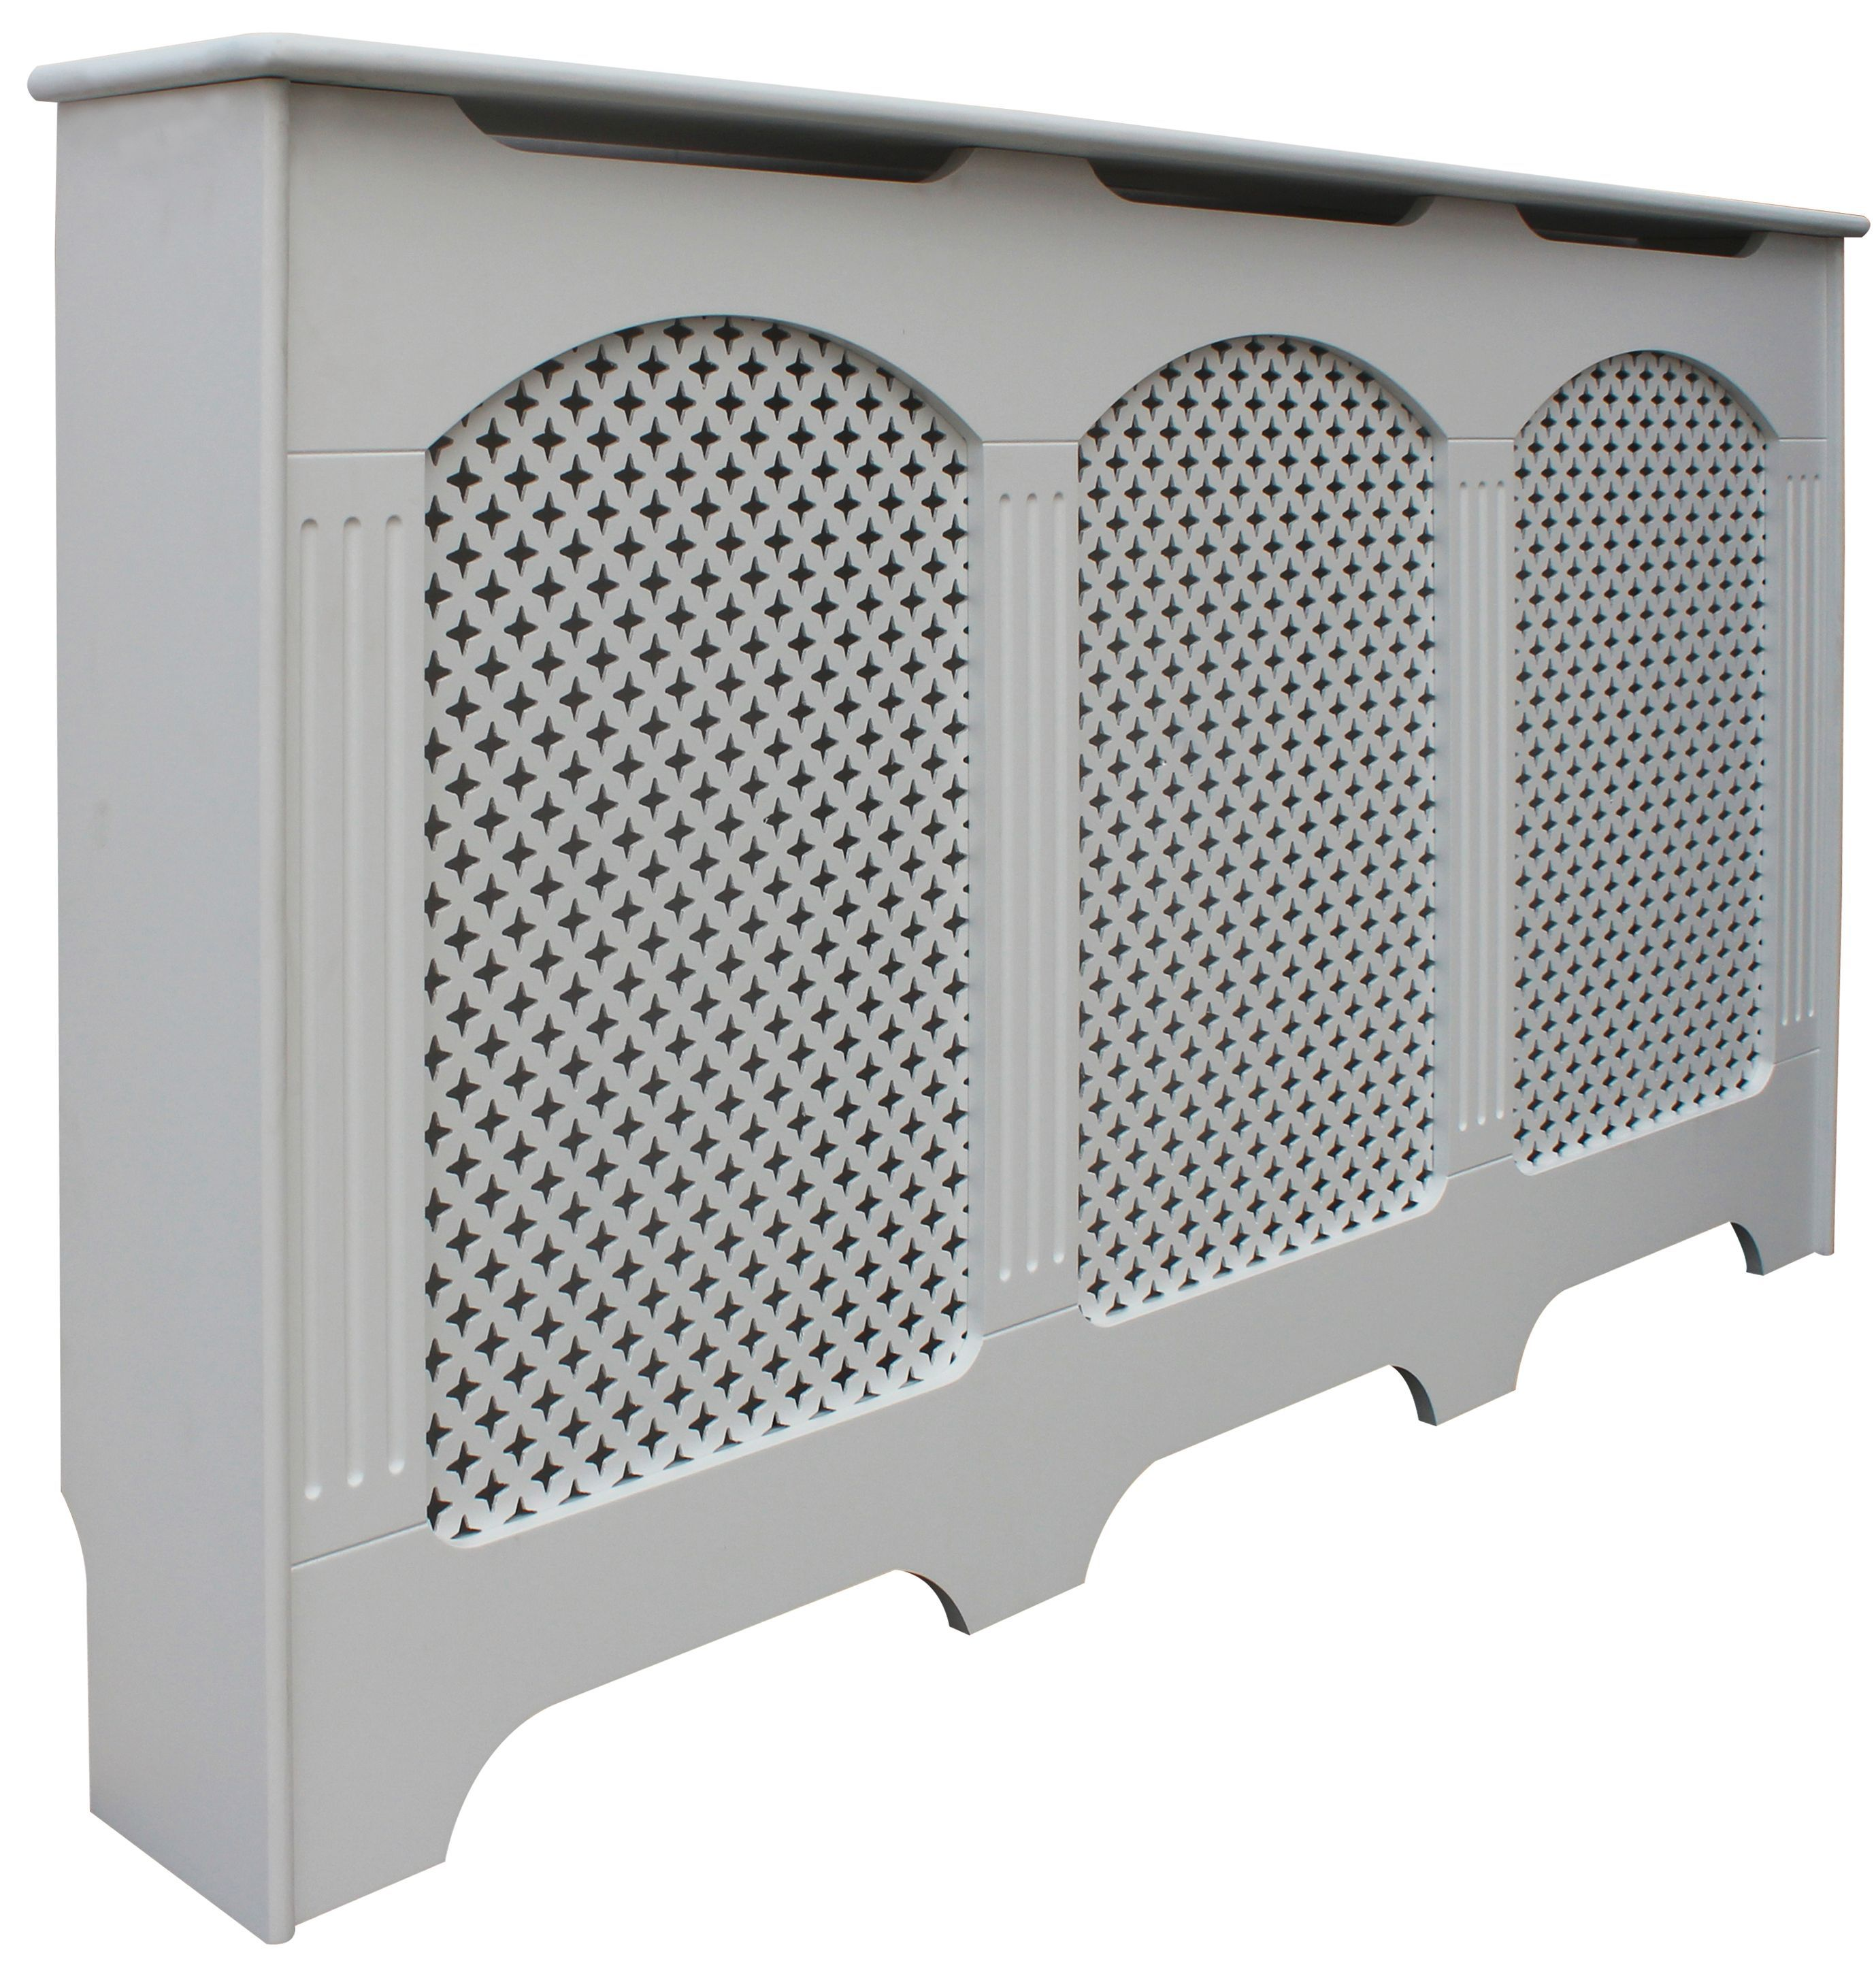 Breakfast Bar Worktop >> Cambridge Large White Painted Radiator cover | Departments ...